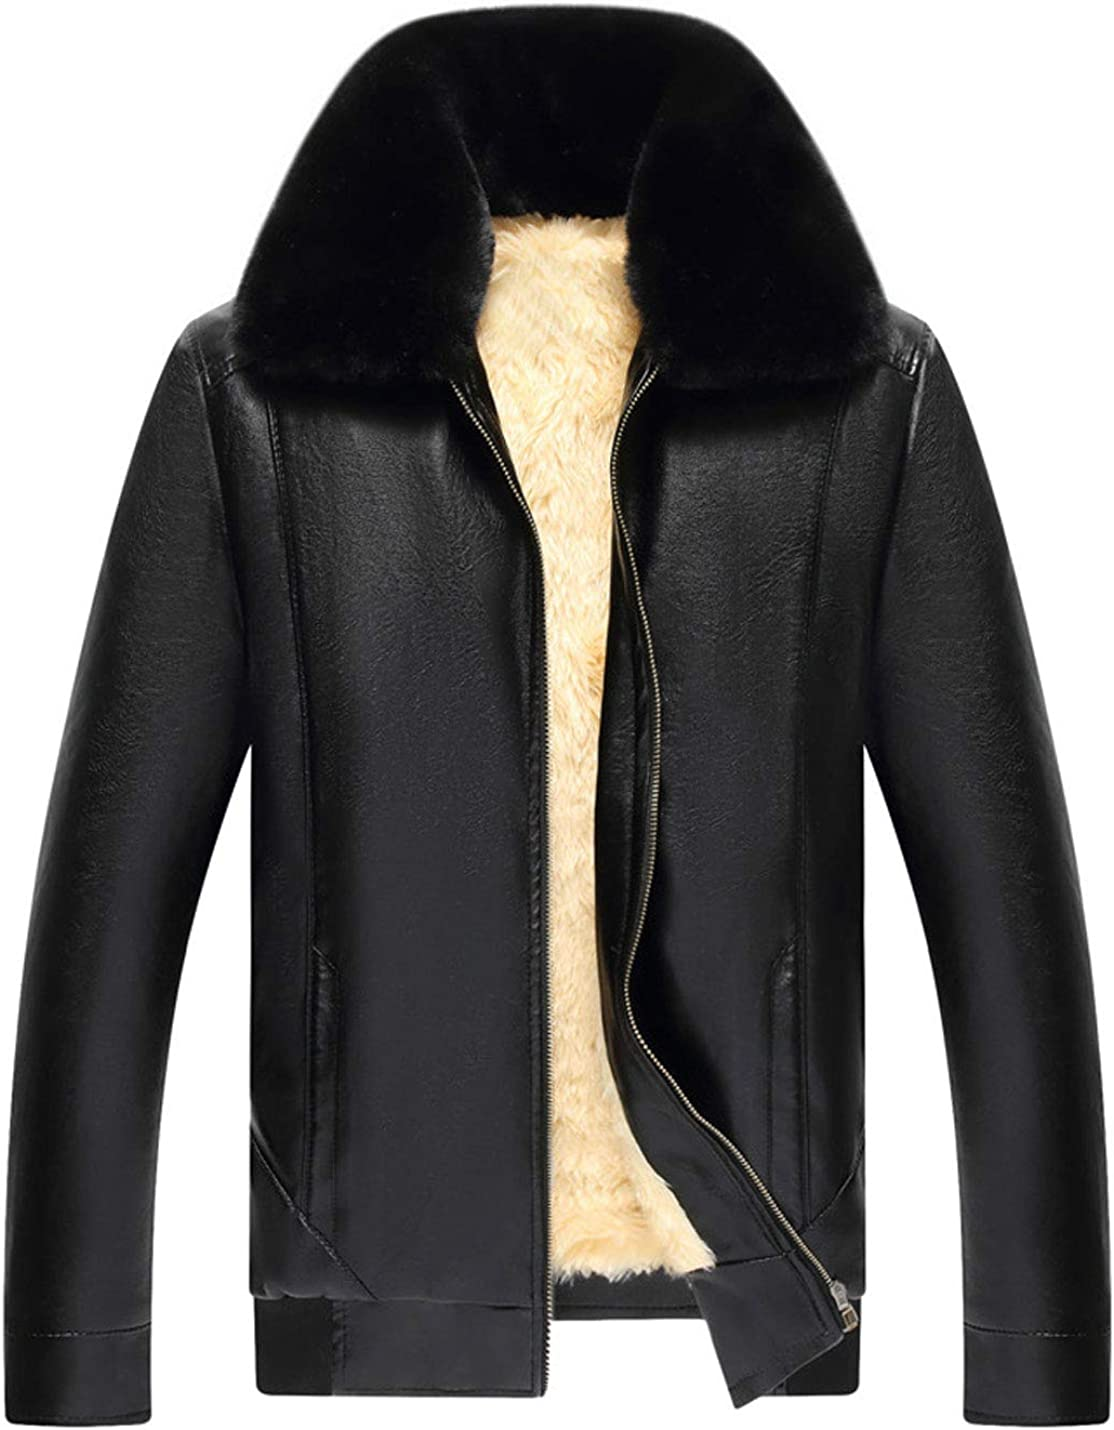 Lentta Mens Casual Faux Fur Trim Fleece Lined PU Leather Trucker Bomber Jacket Coats